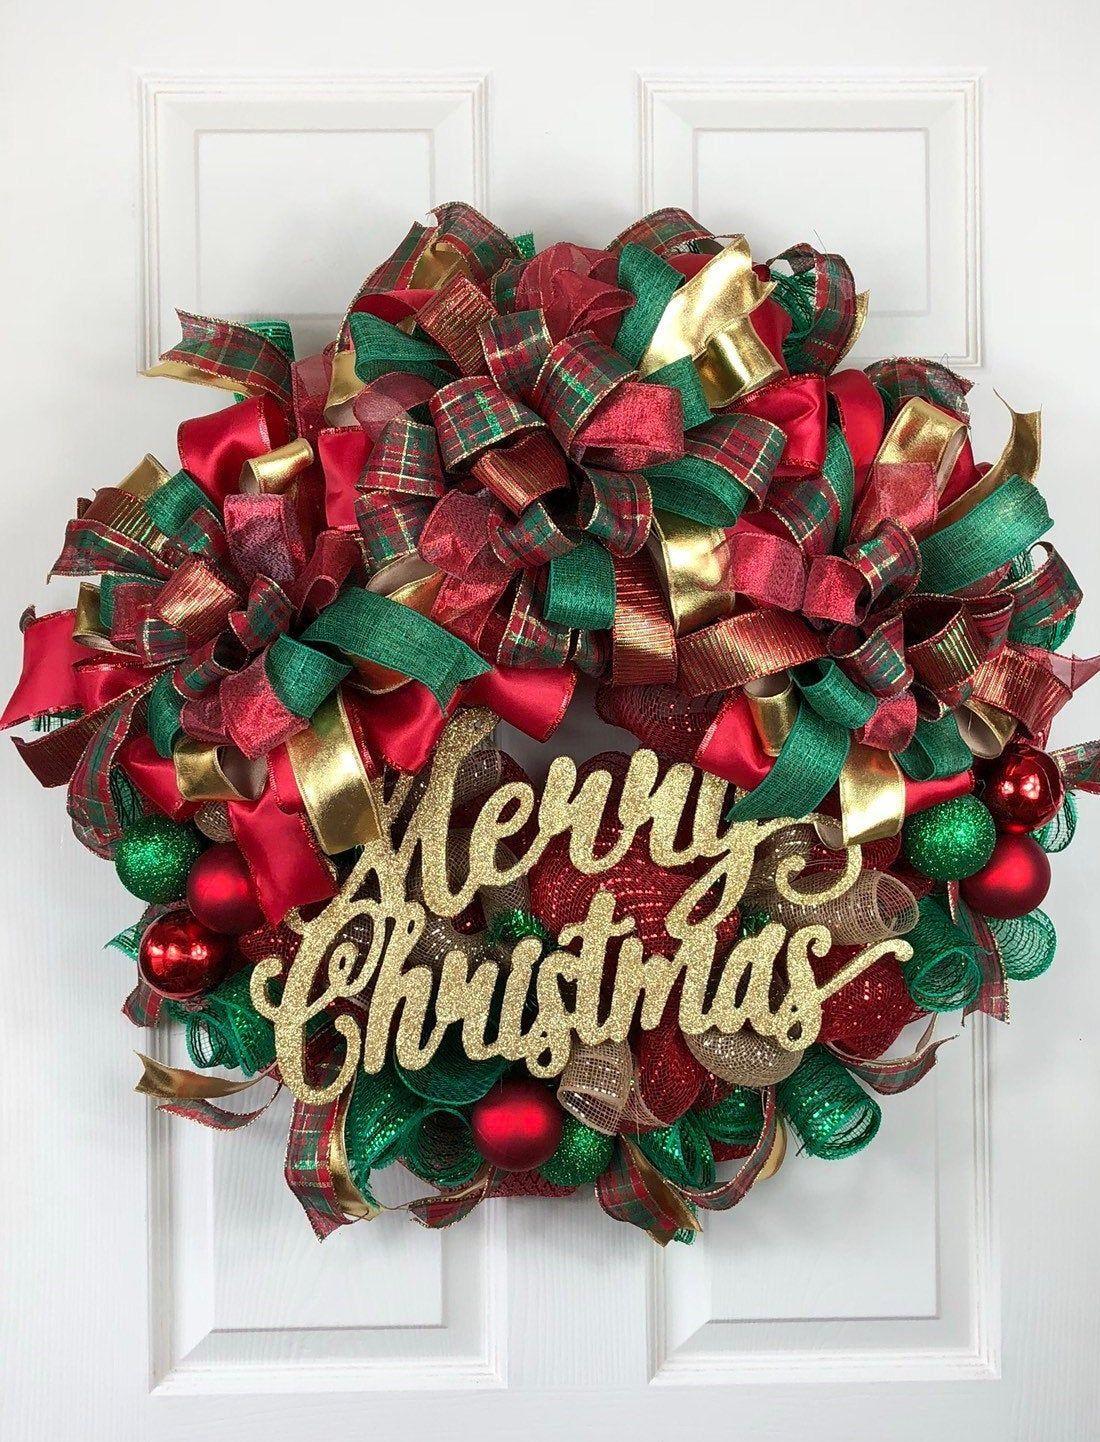 Christmas Wreath, Deco Mesh Christmas Wreath, Christmas Wreath, Holiday Wreath, Custom Door Wreath, Best Front Door Wreath, MerryChristmas by BelleChaseWreaths on Etsy